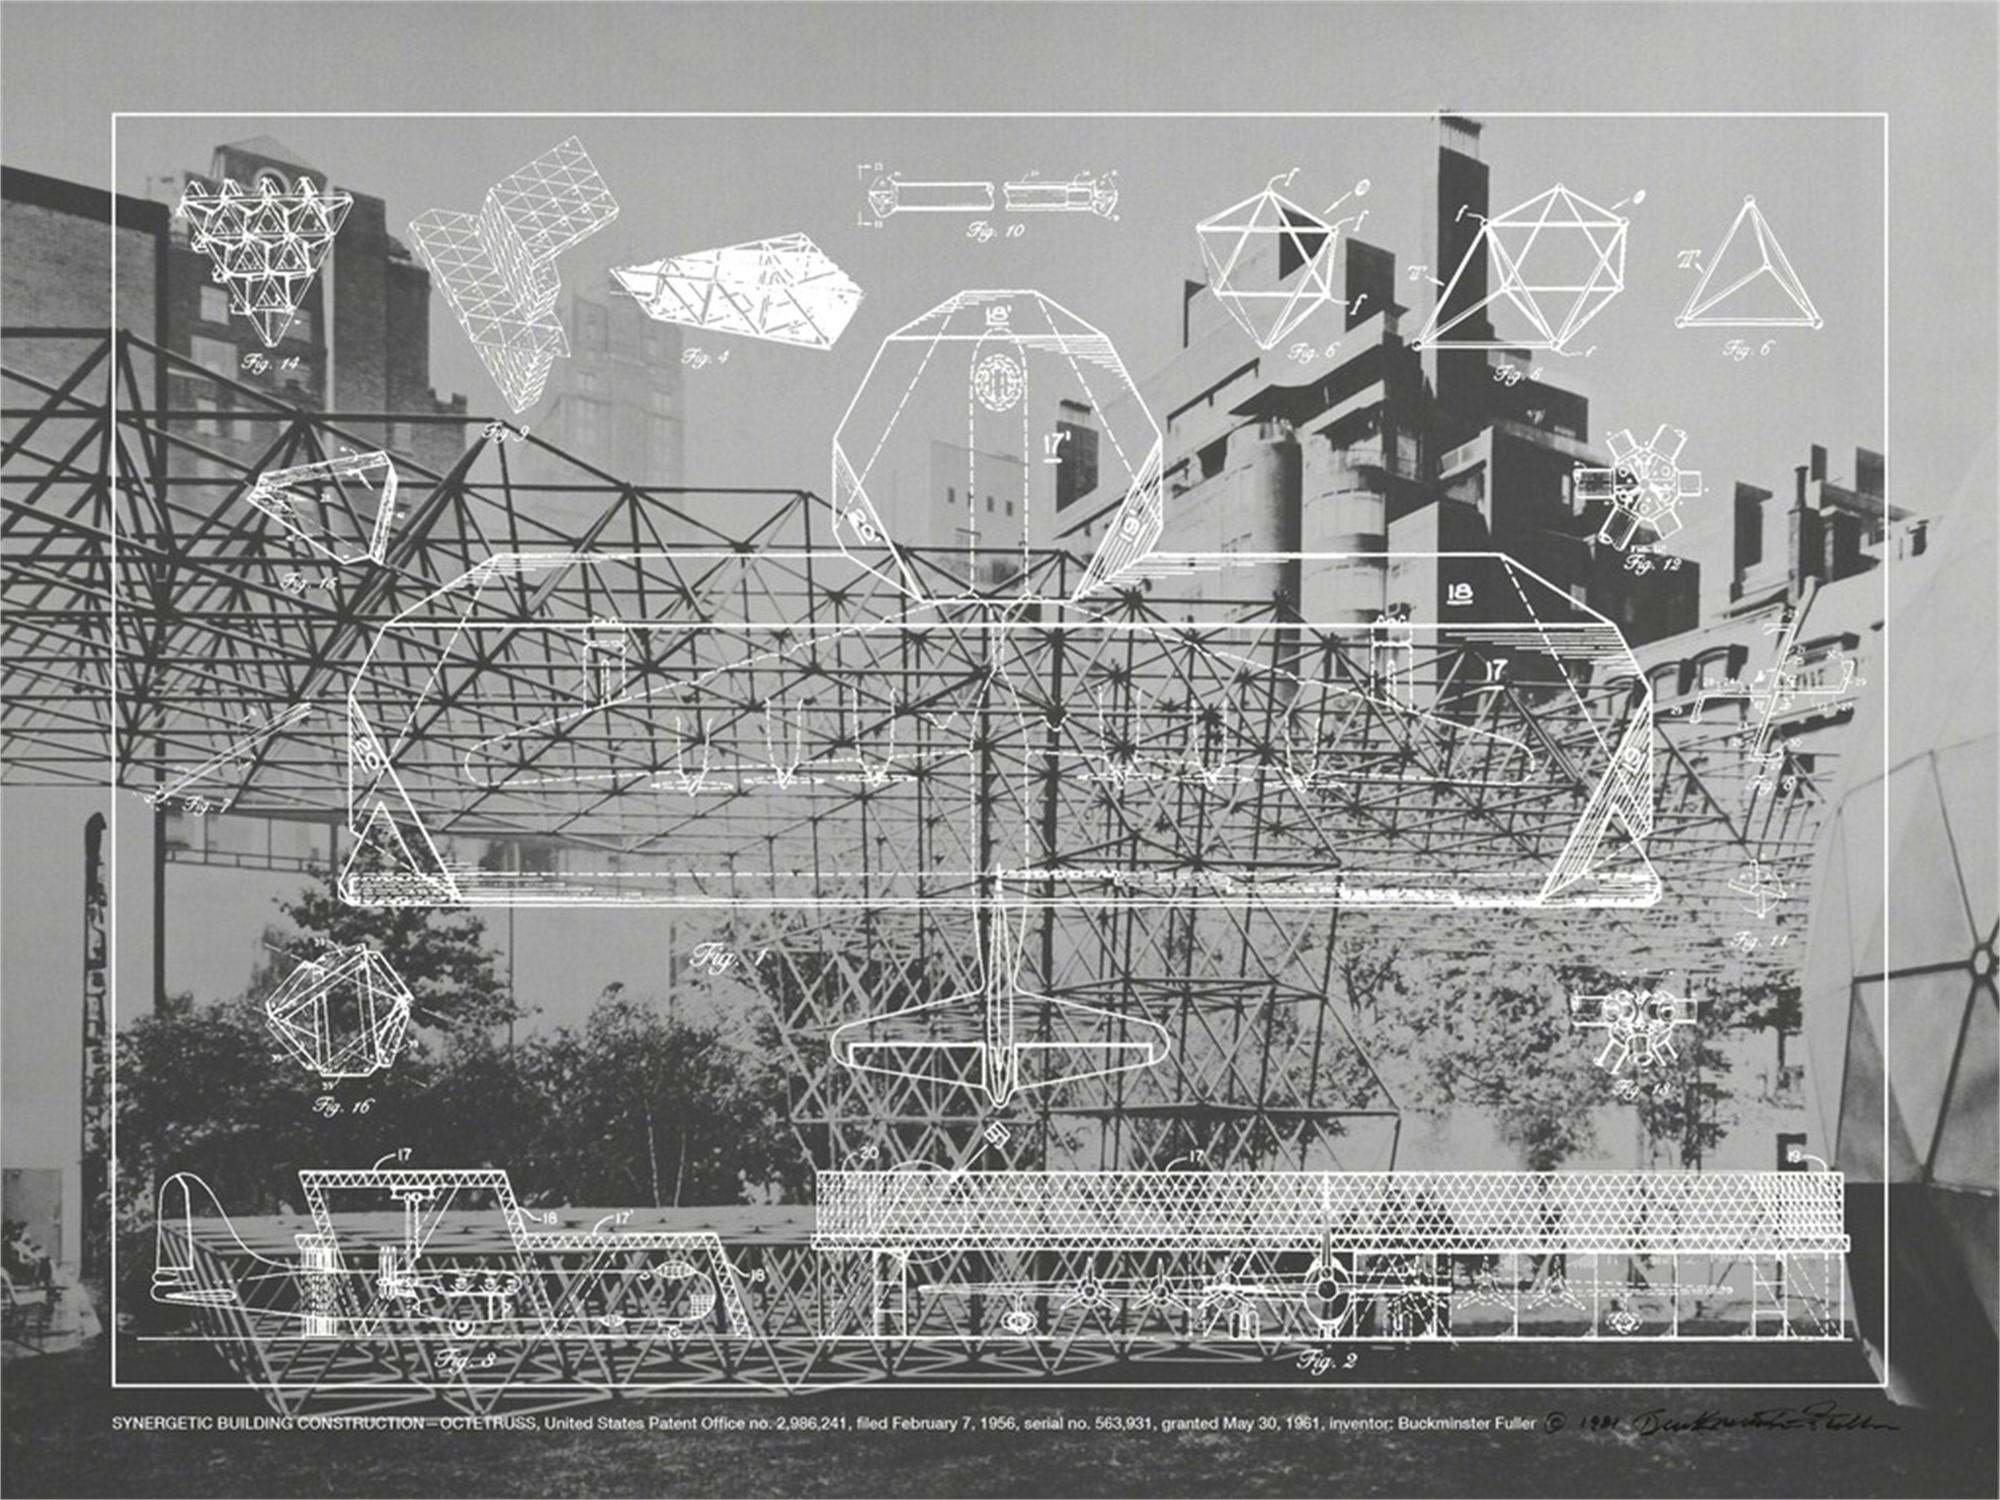 Synergetic Building Construction- Octetruss by Buckminster Fuller